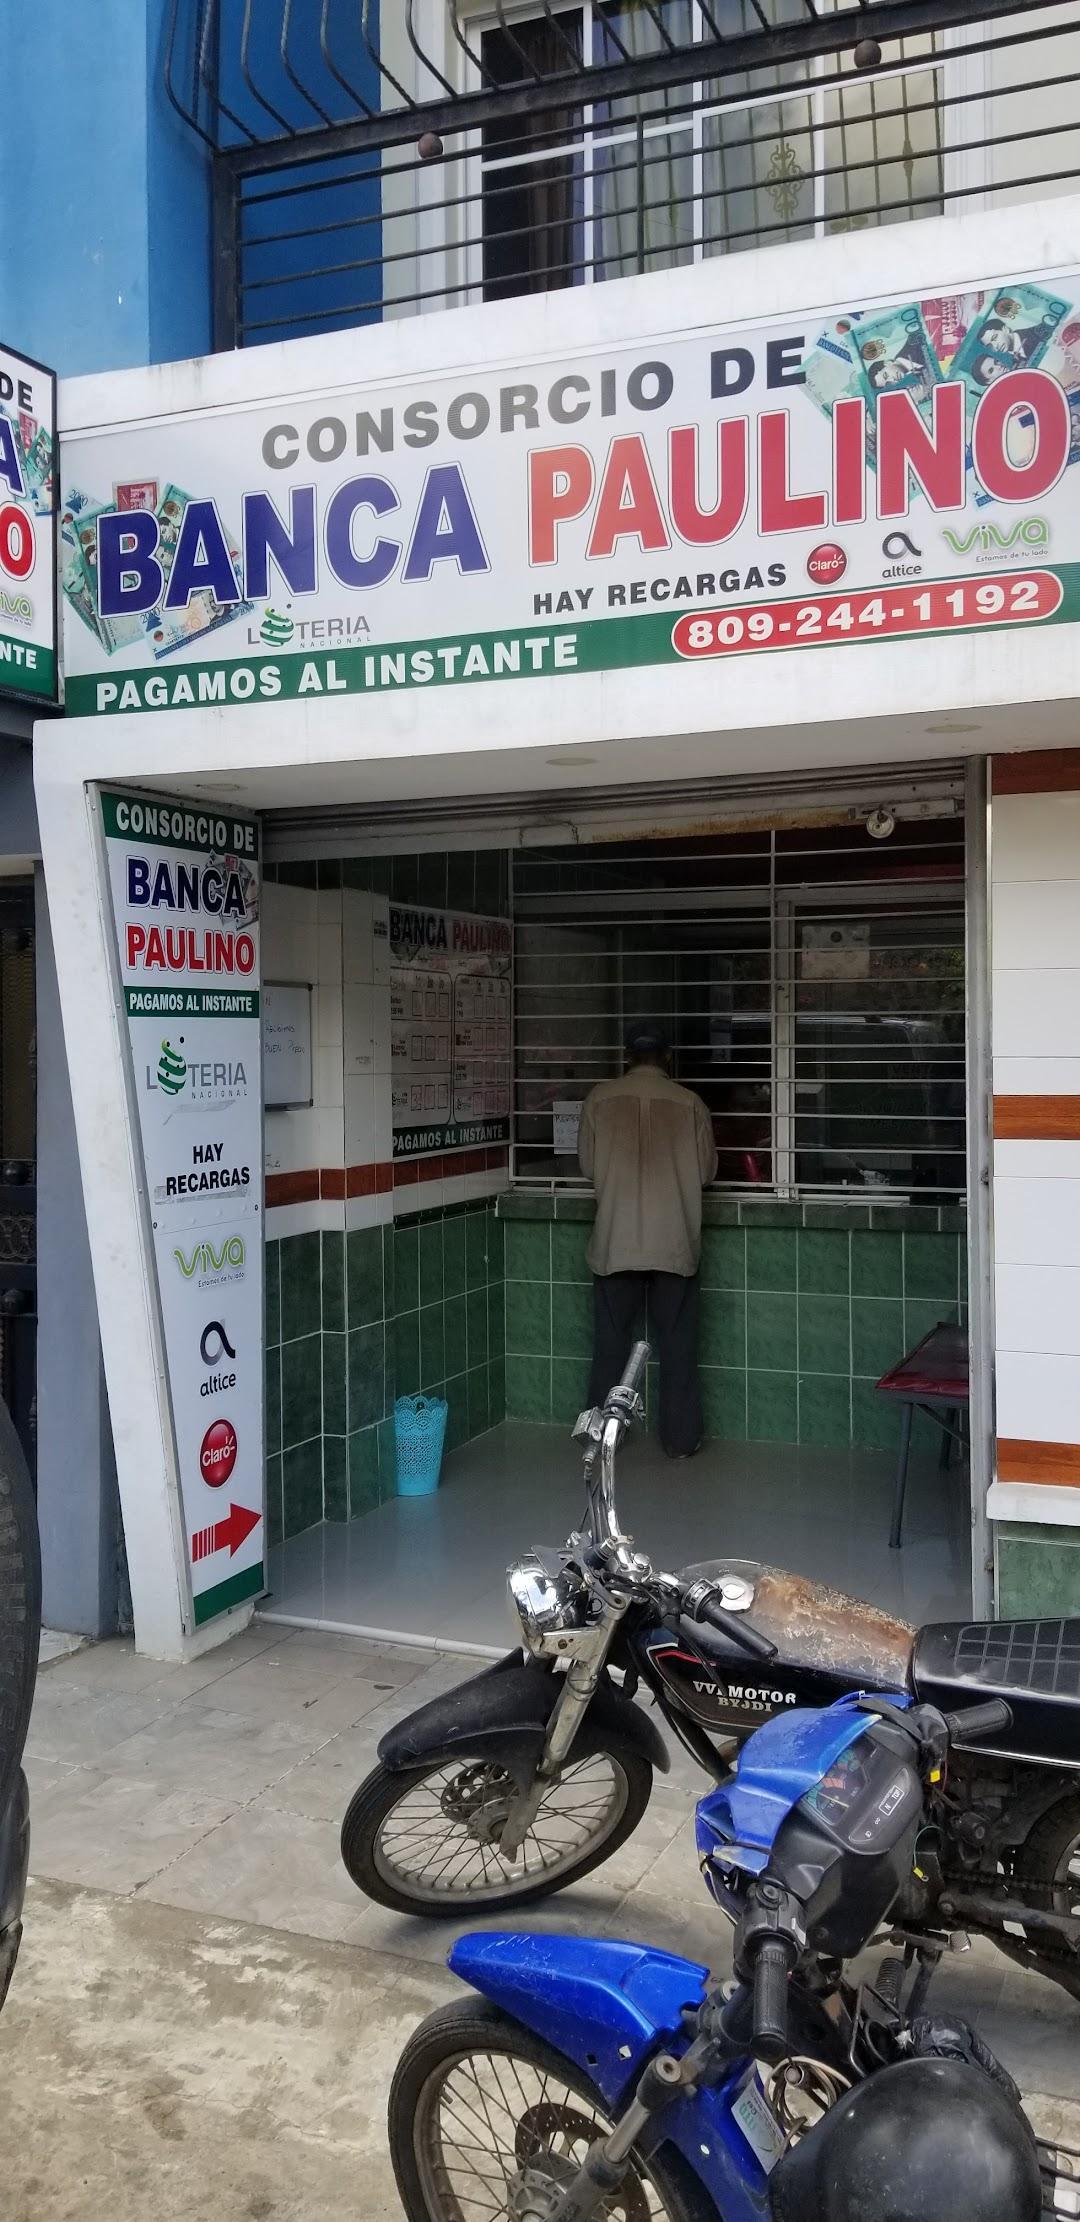 Banca Paulino